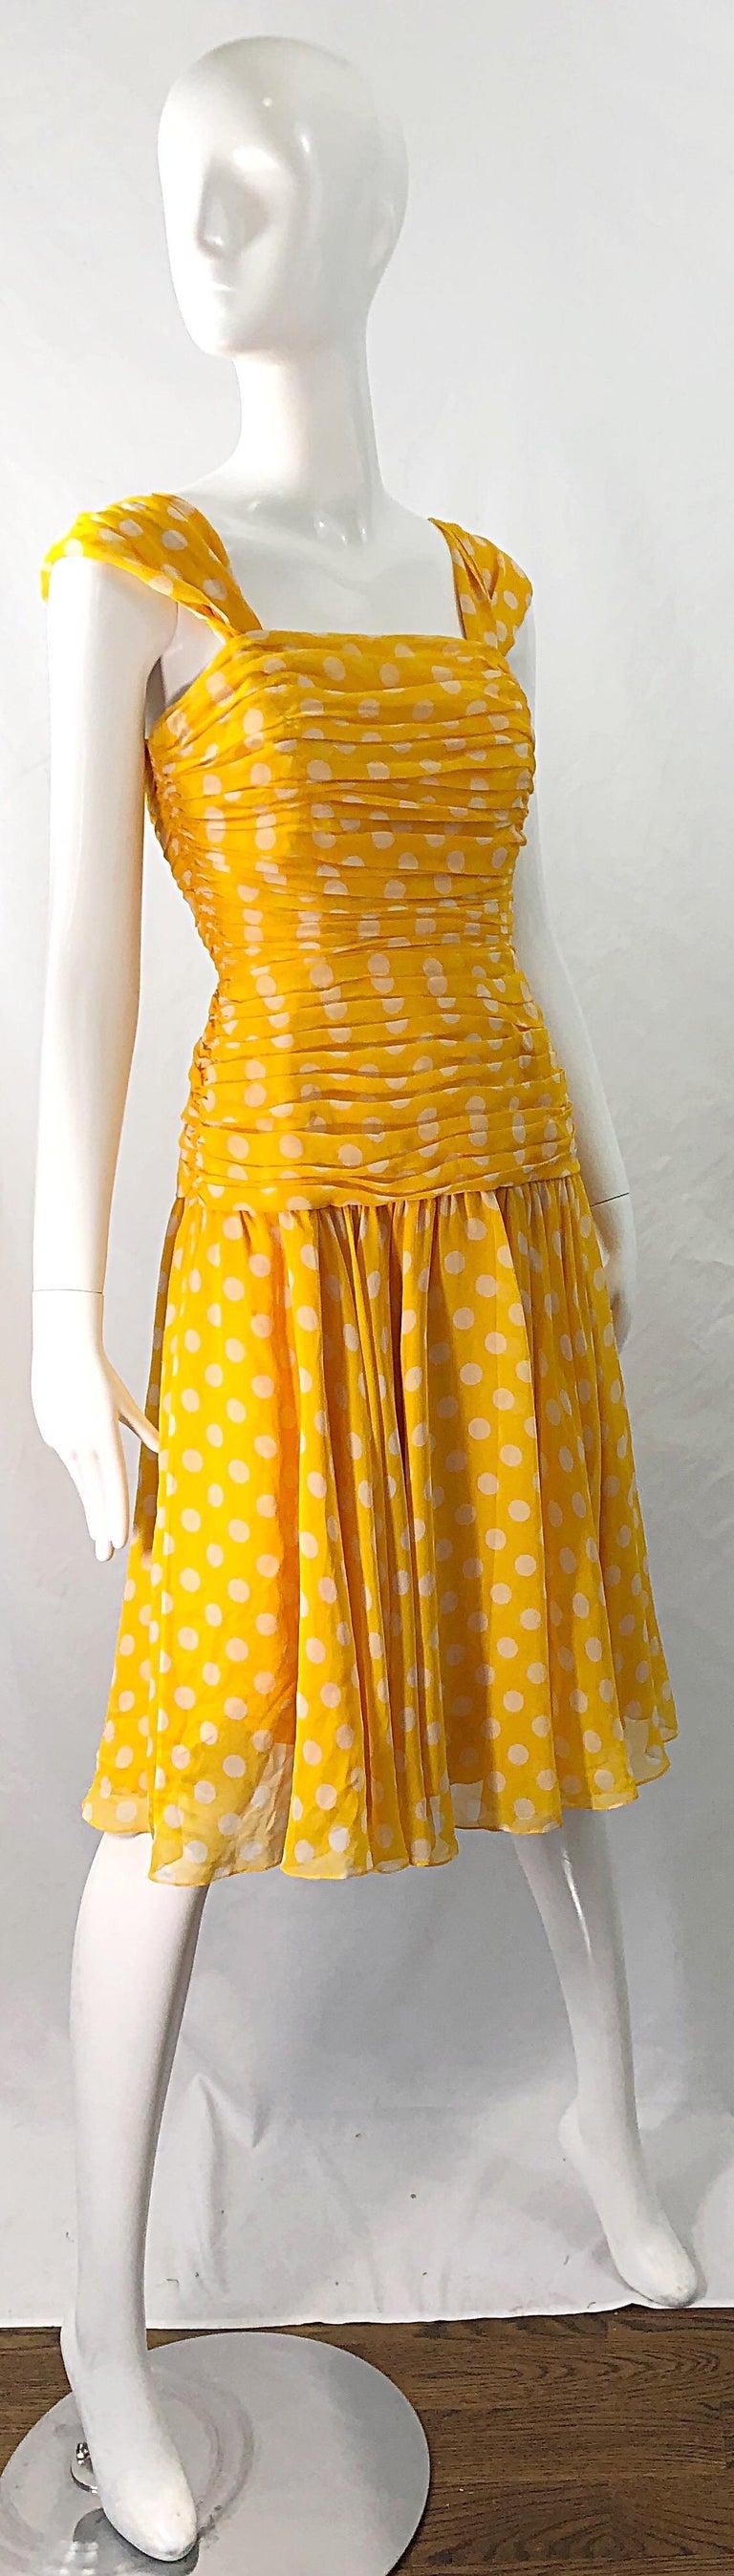 Adele Simpson 1980s Size 4 Yellow White Silk Chiffon Polka Dot Vintage 80s Dress For Sale 6